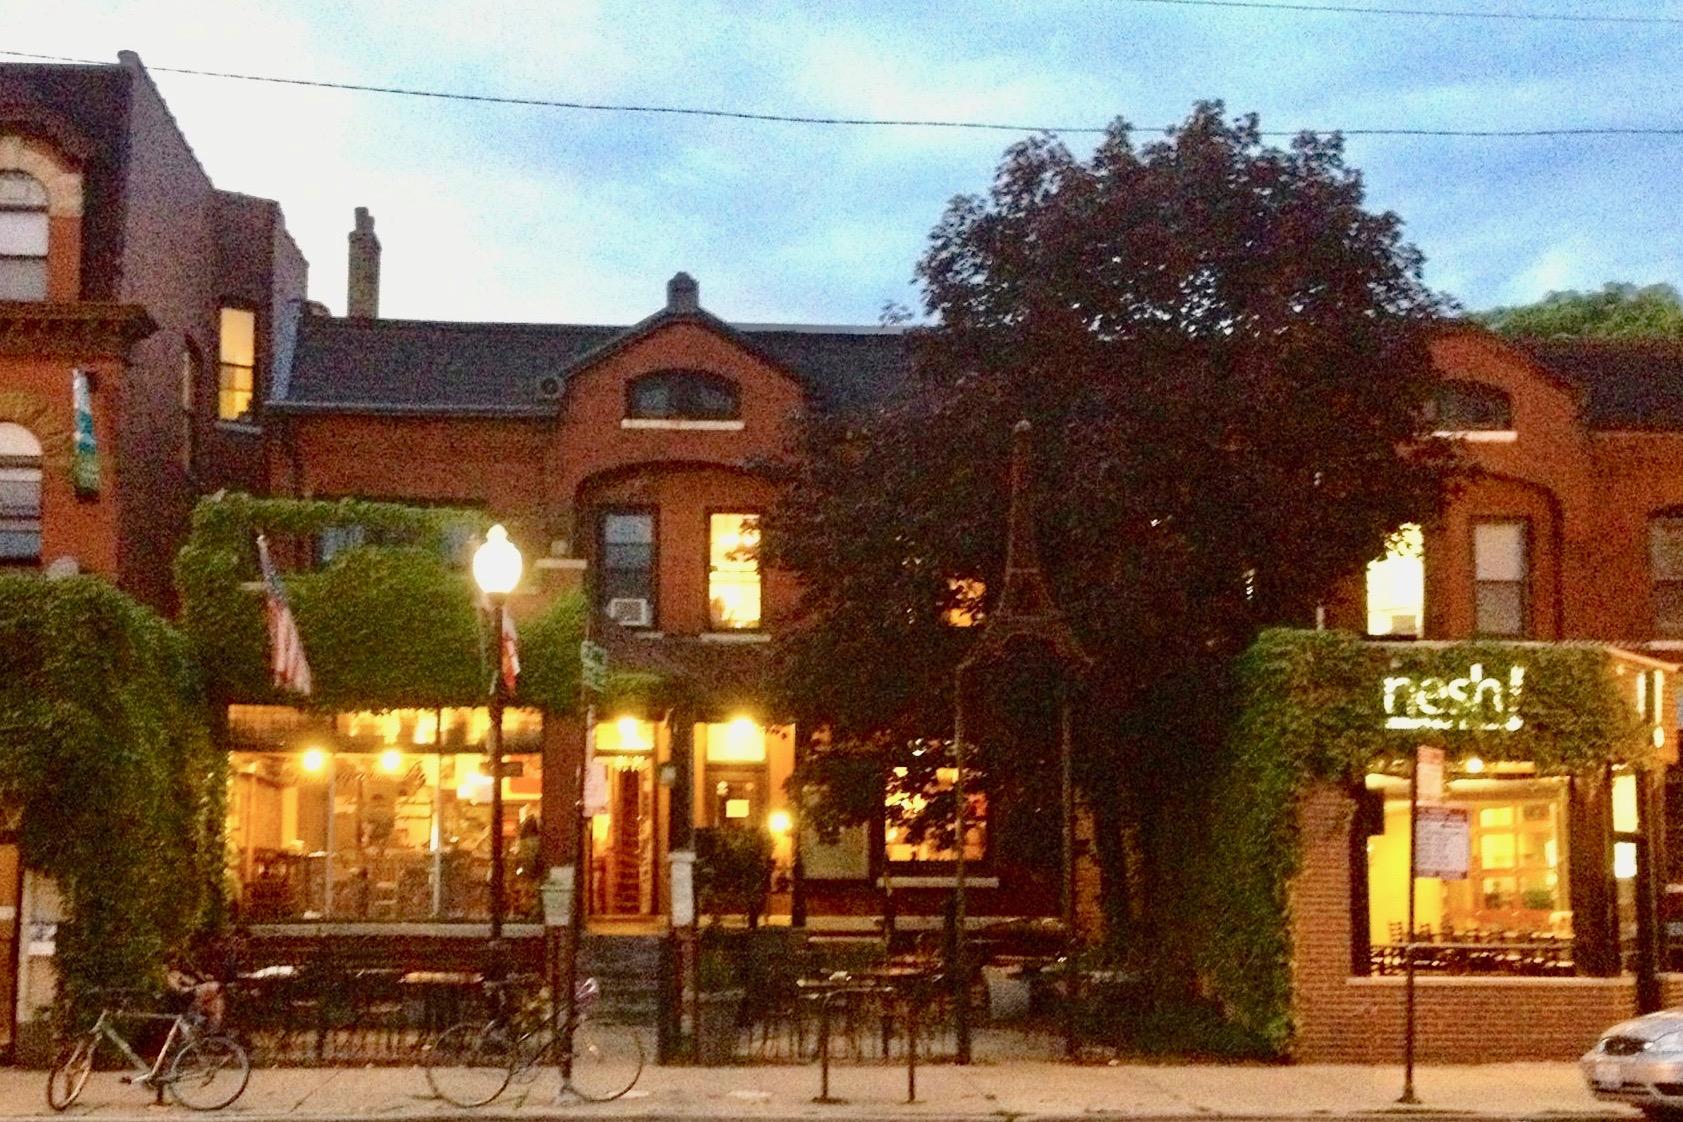 Bourgeois Pig Café, a neighborhood classic